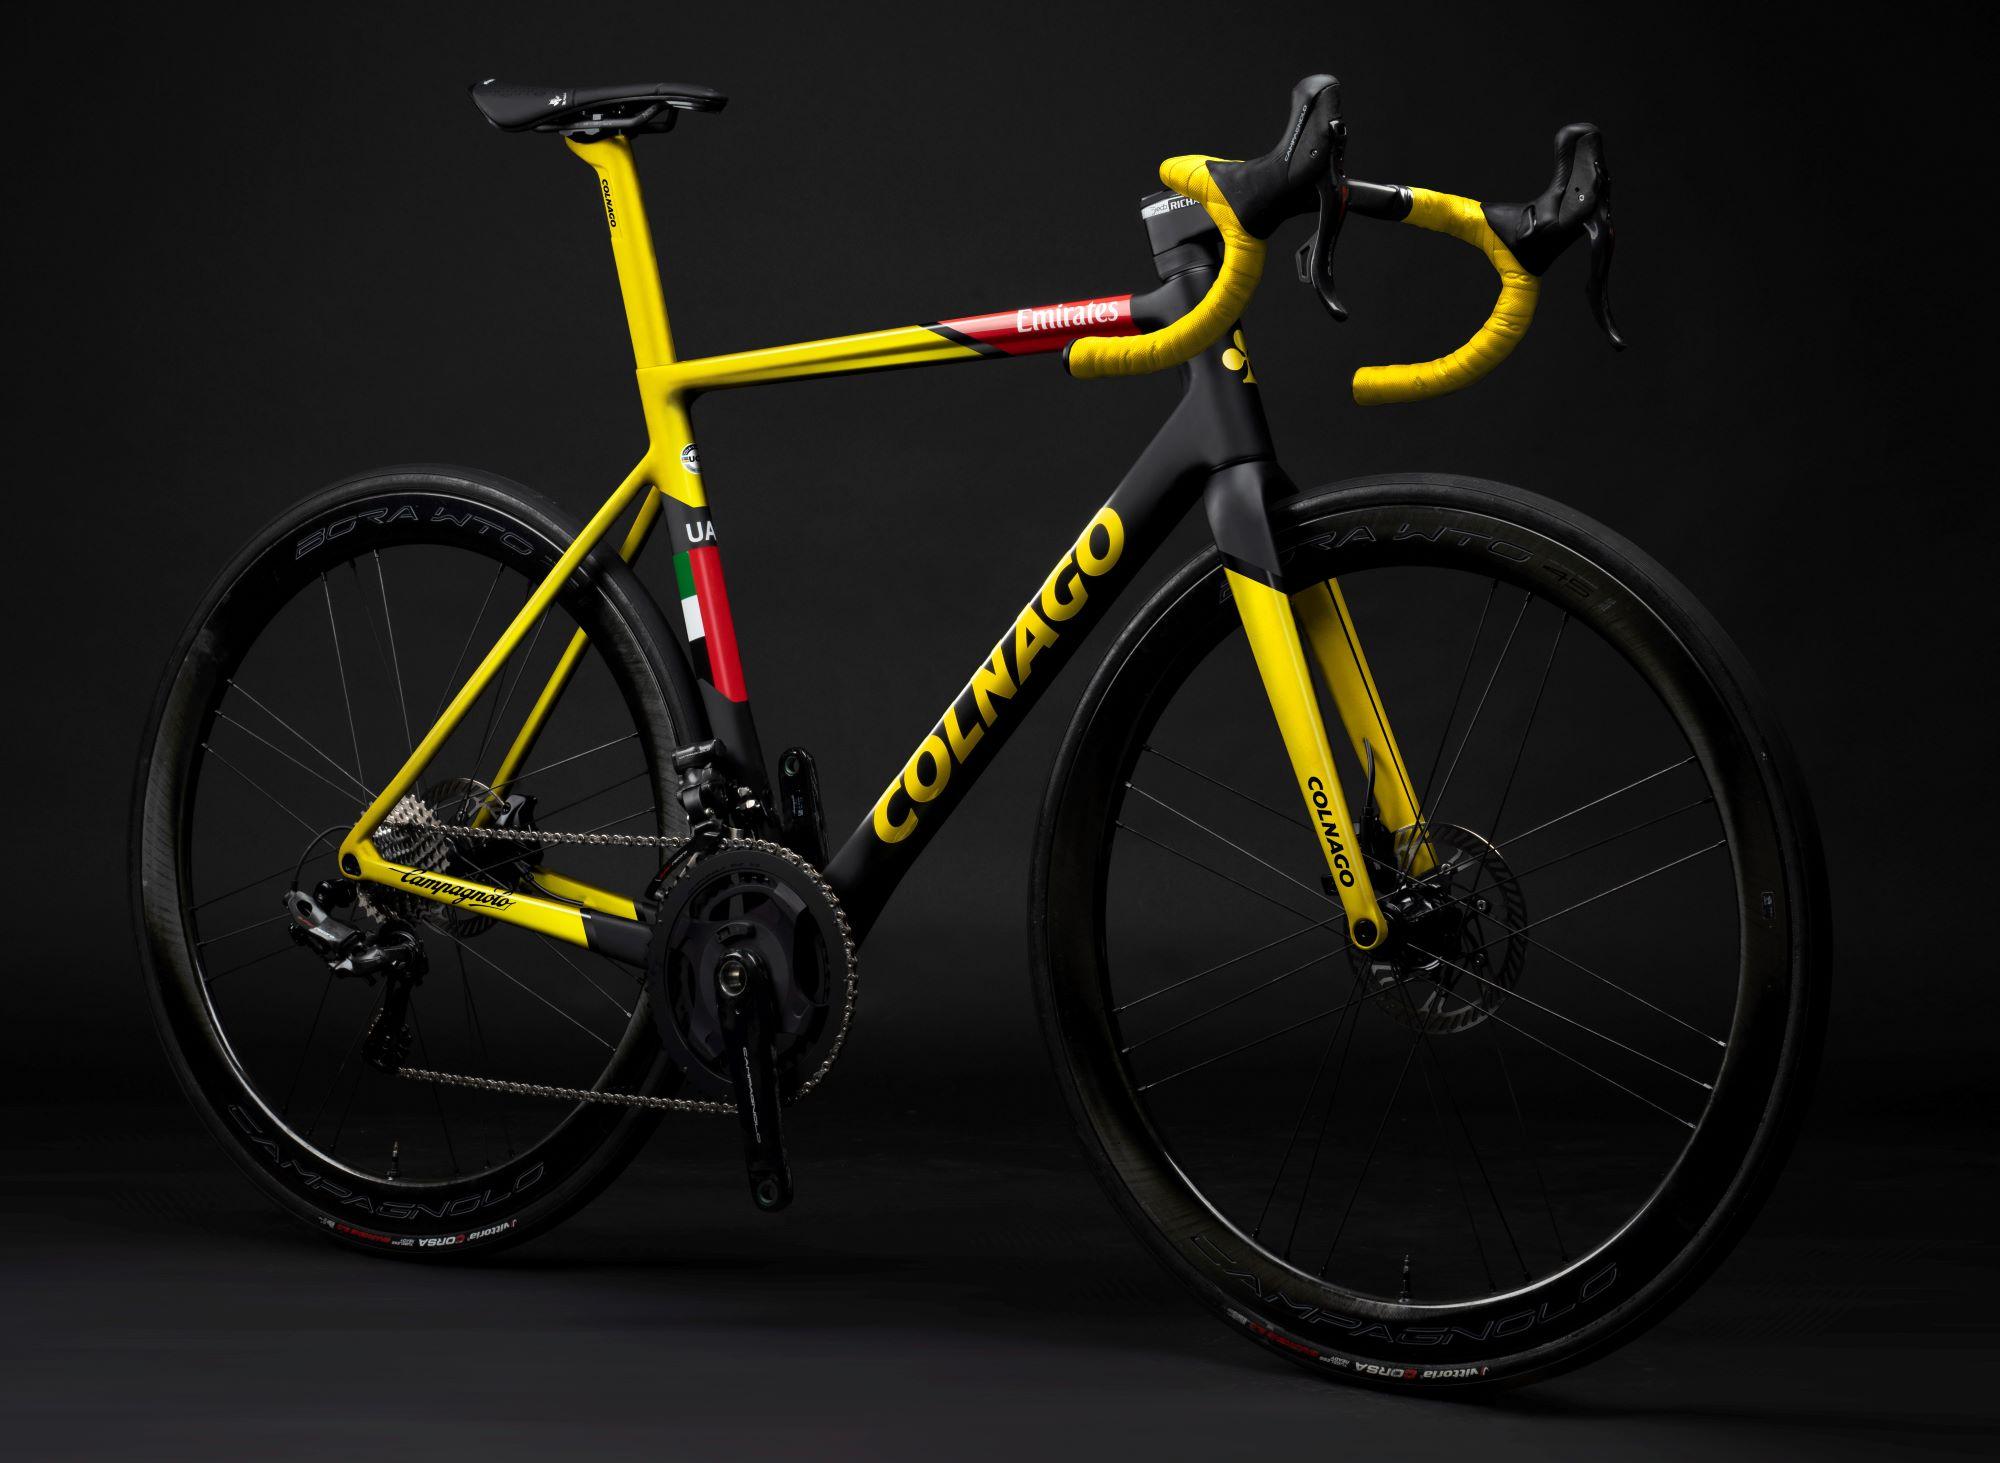 special edition colnago v3rs pogacar yellow bike